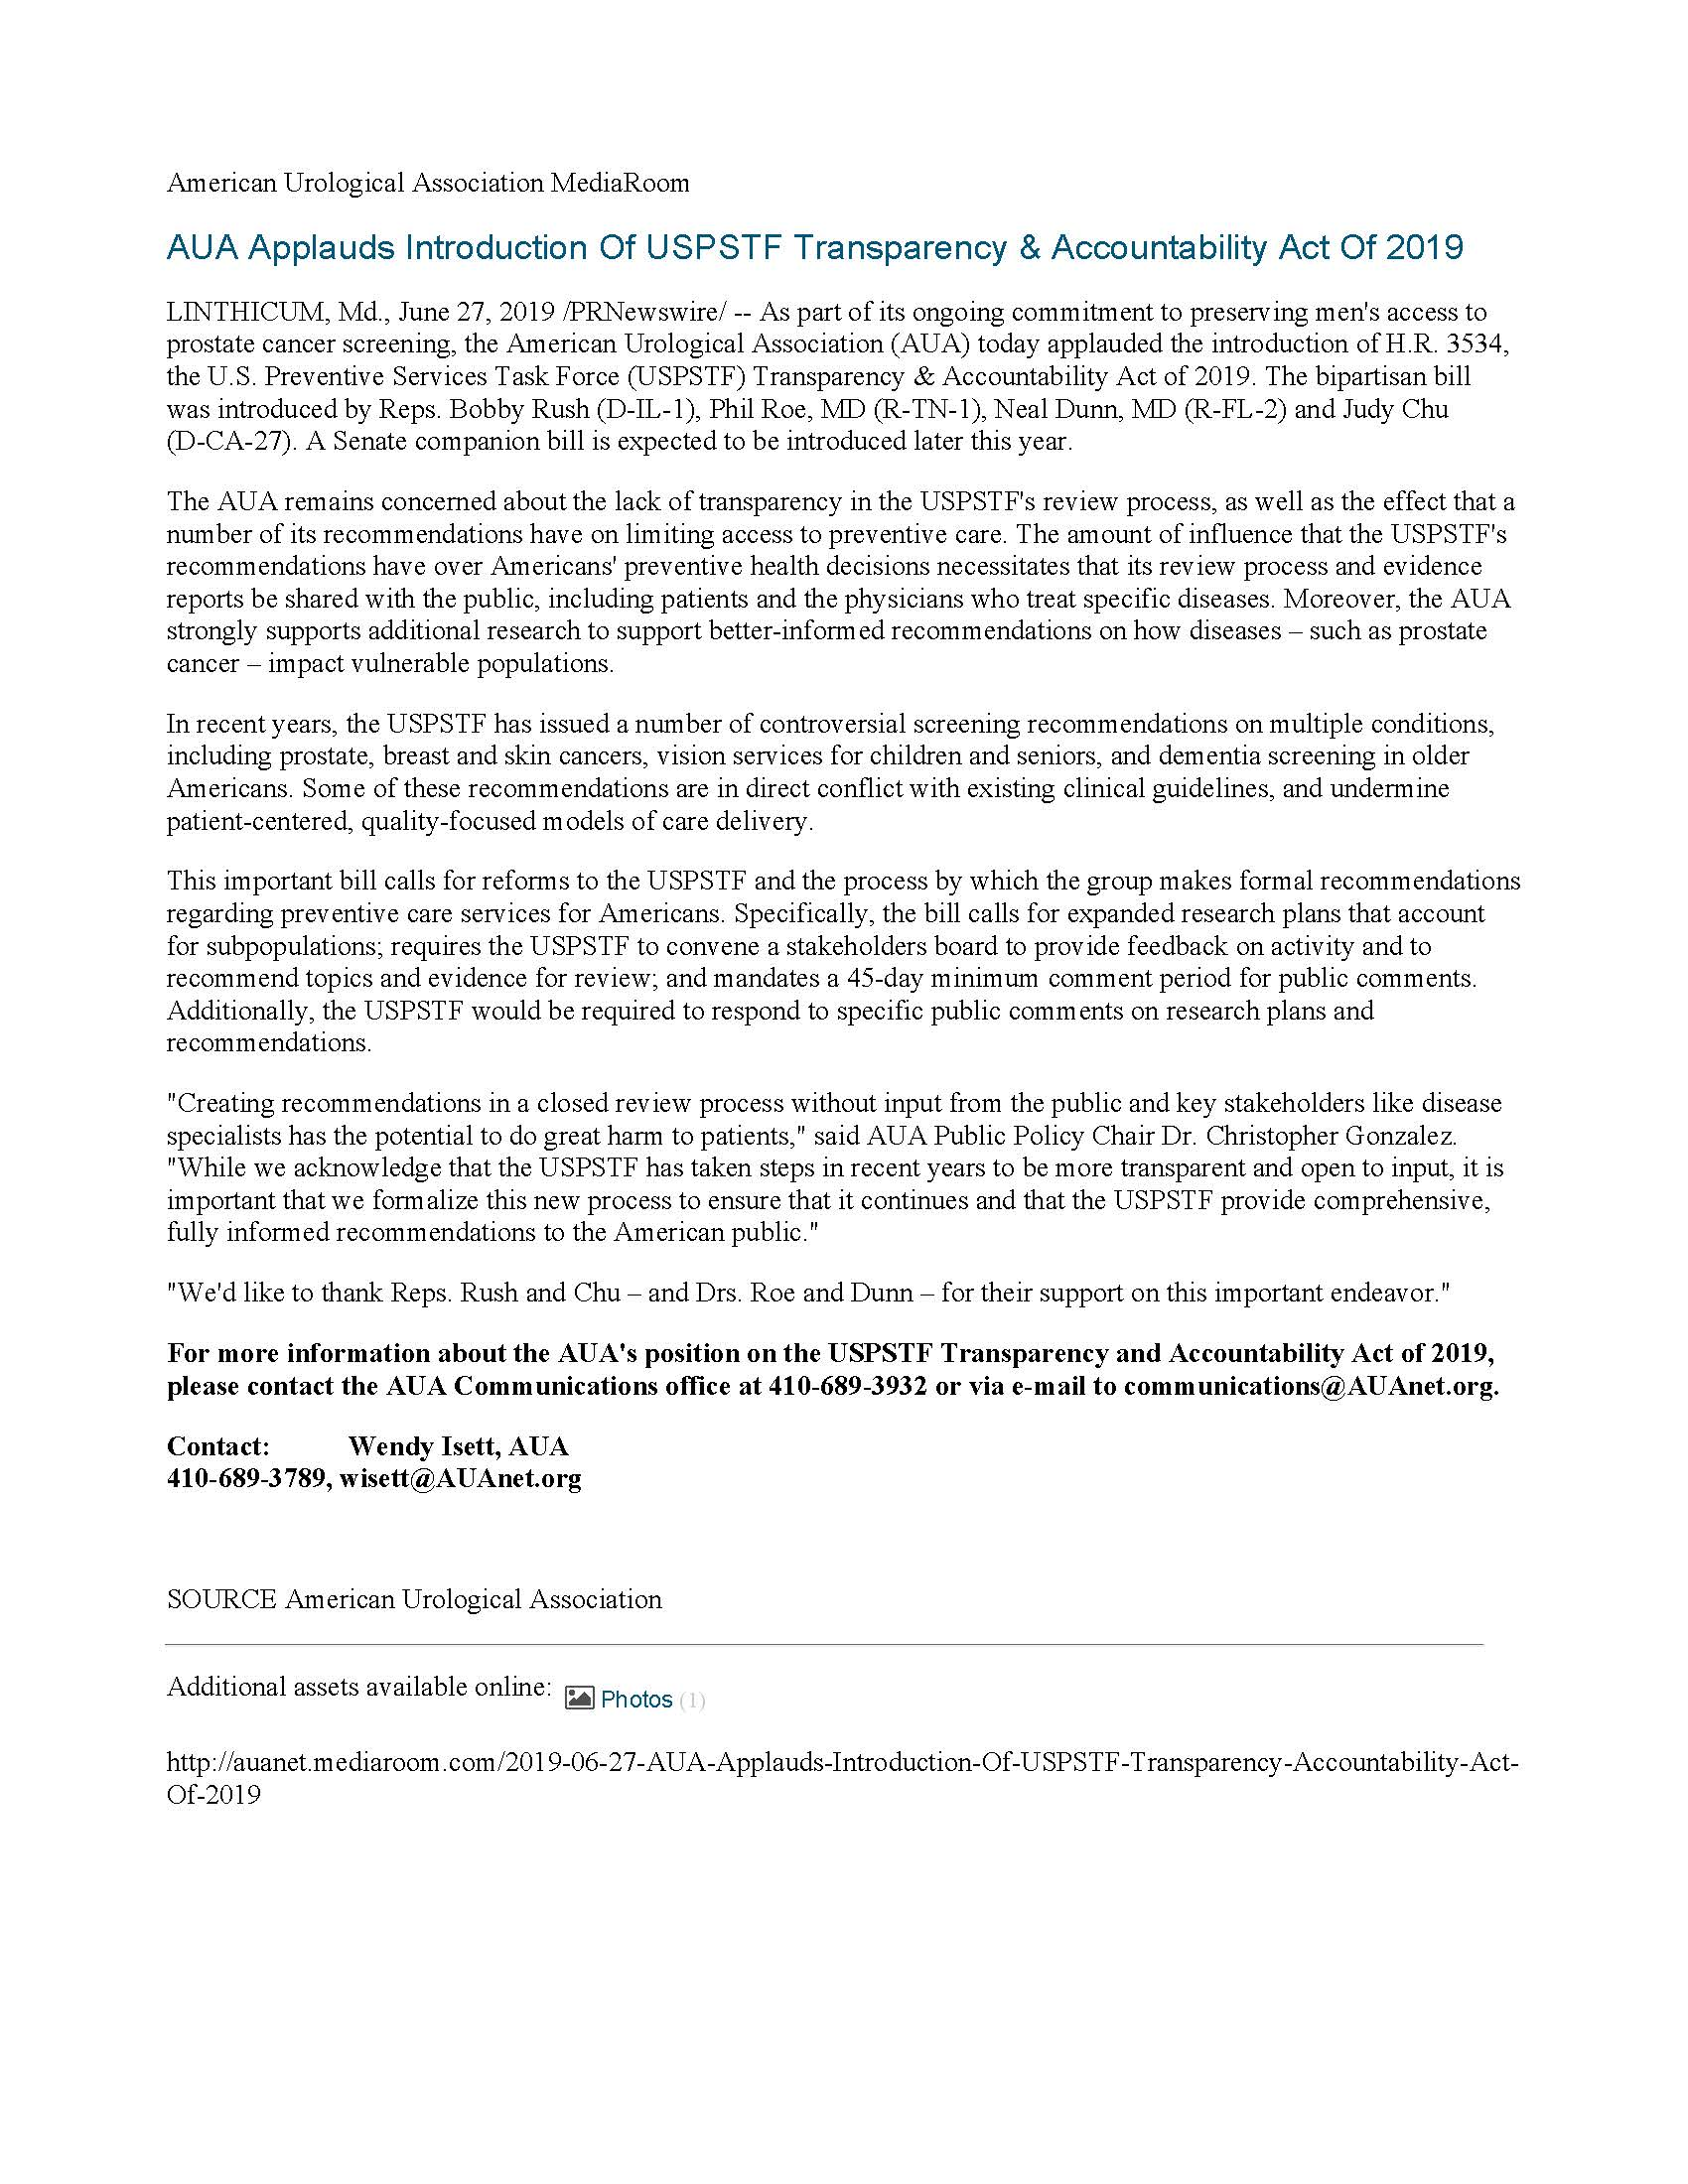 pdf of auapress release